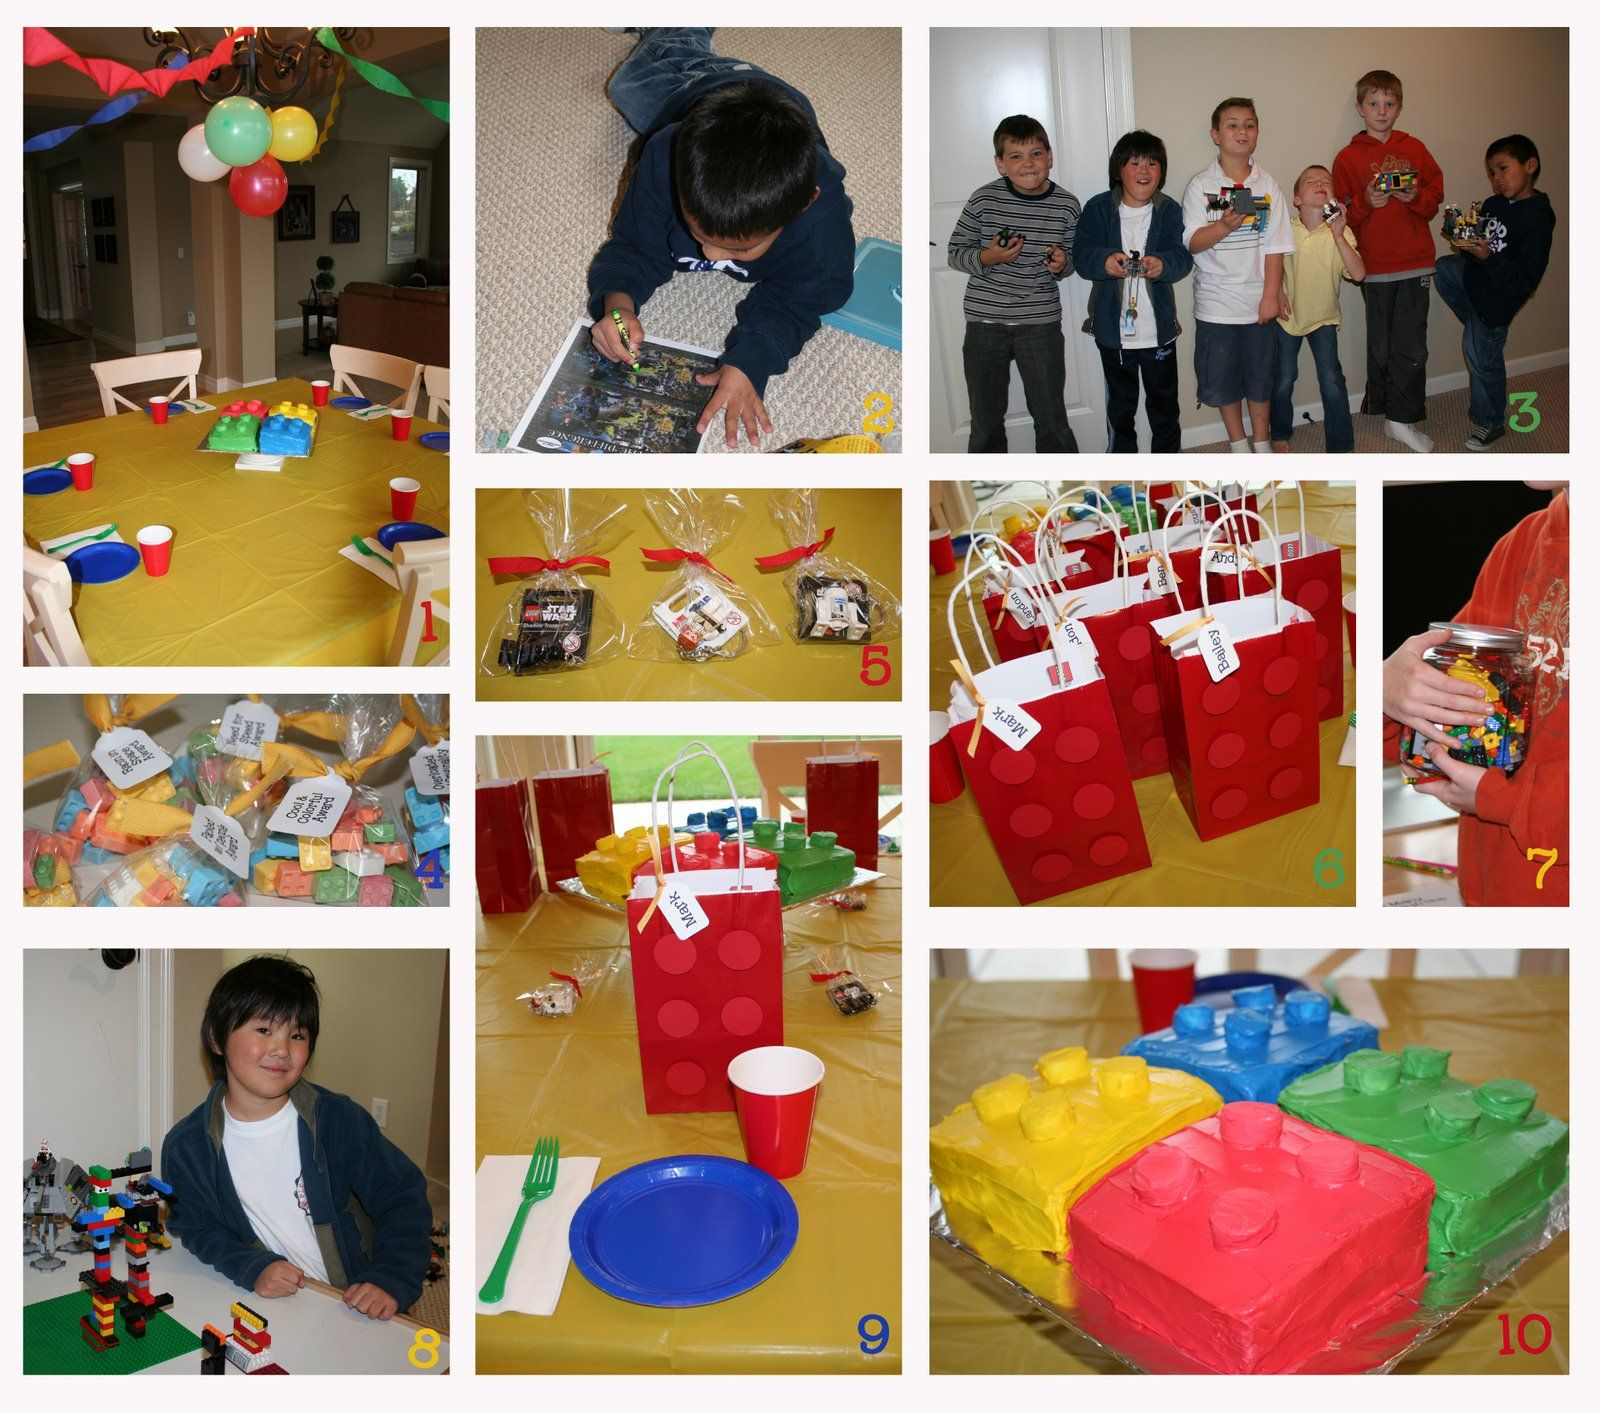 Creative Holiday Gift Ideas: Lego Party Ideas